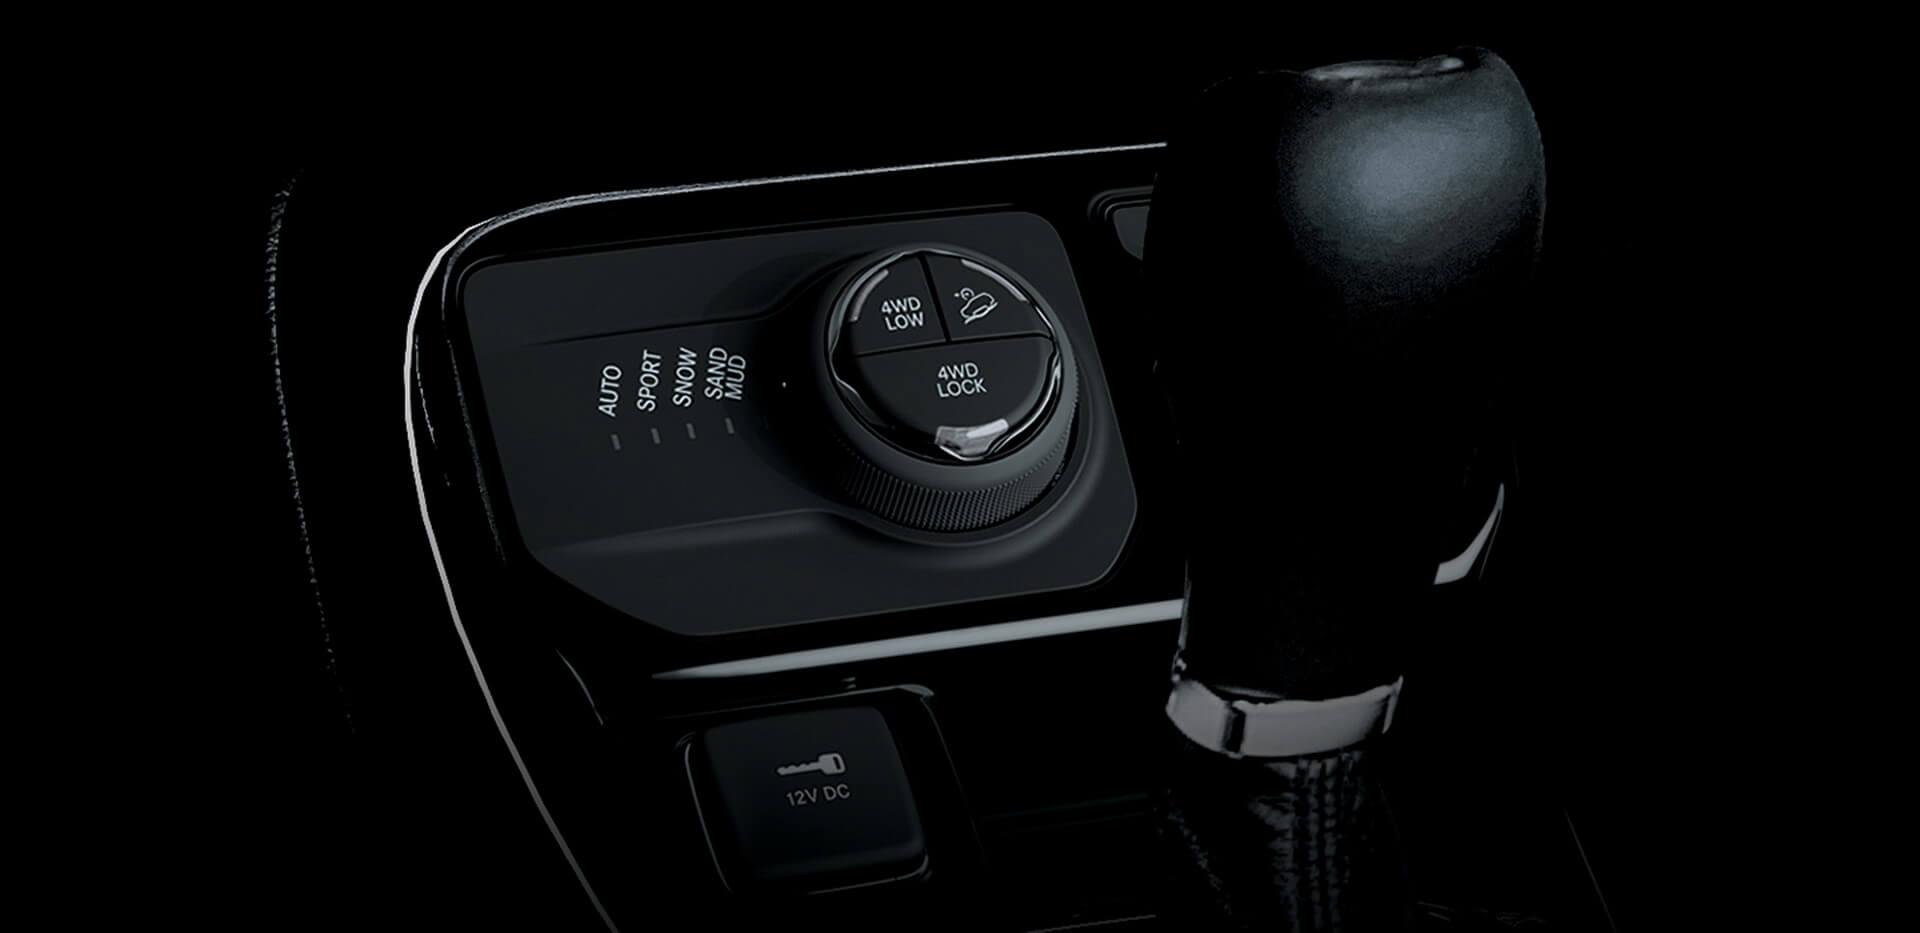 Фотография экоавто Jeep Compass 4xe - фото 24